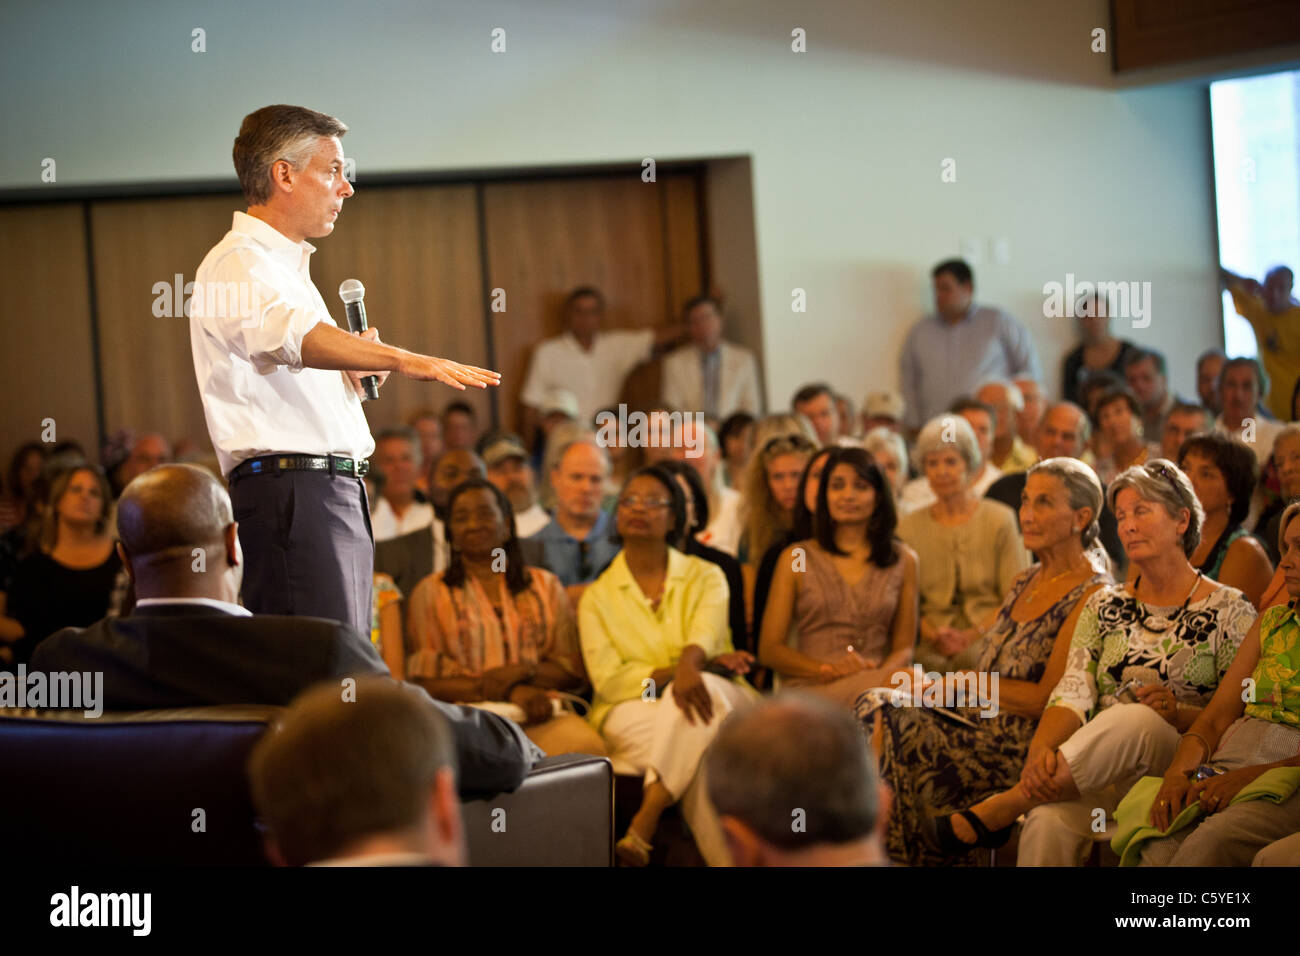 GOP Presidential candidate Jon Huntsman campaigns in Charleston, SC - Stock Image